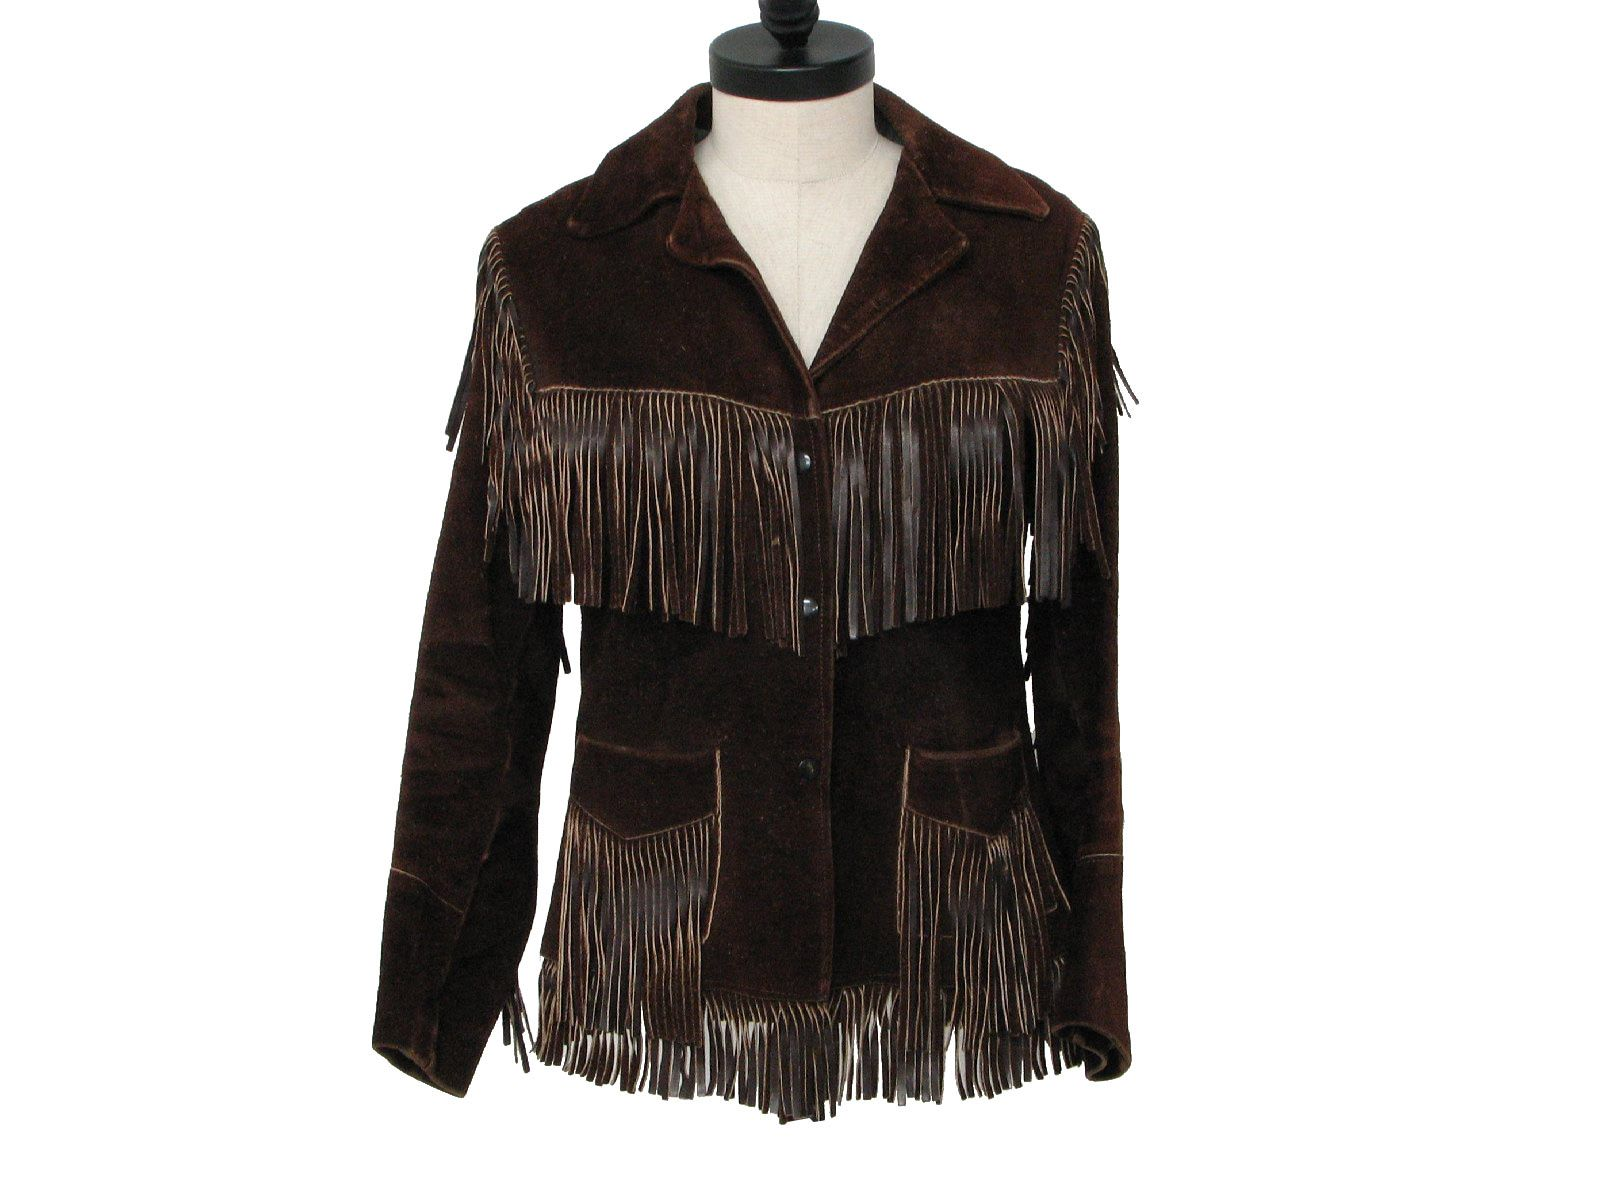 1960's Joo Kay Womens Suede Fringed Leather Jacket